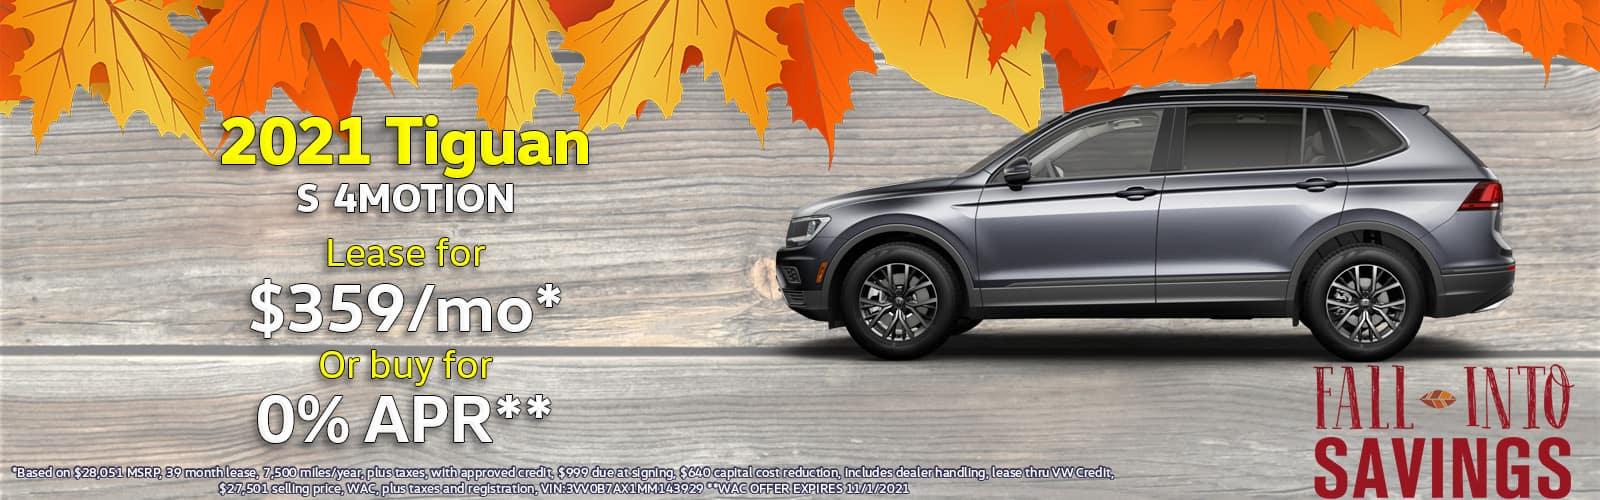 2021 VW Tiguan Lease Special Denver, Colorado